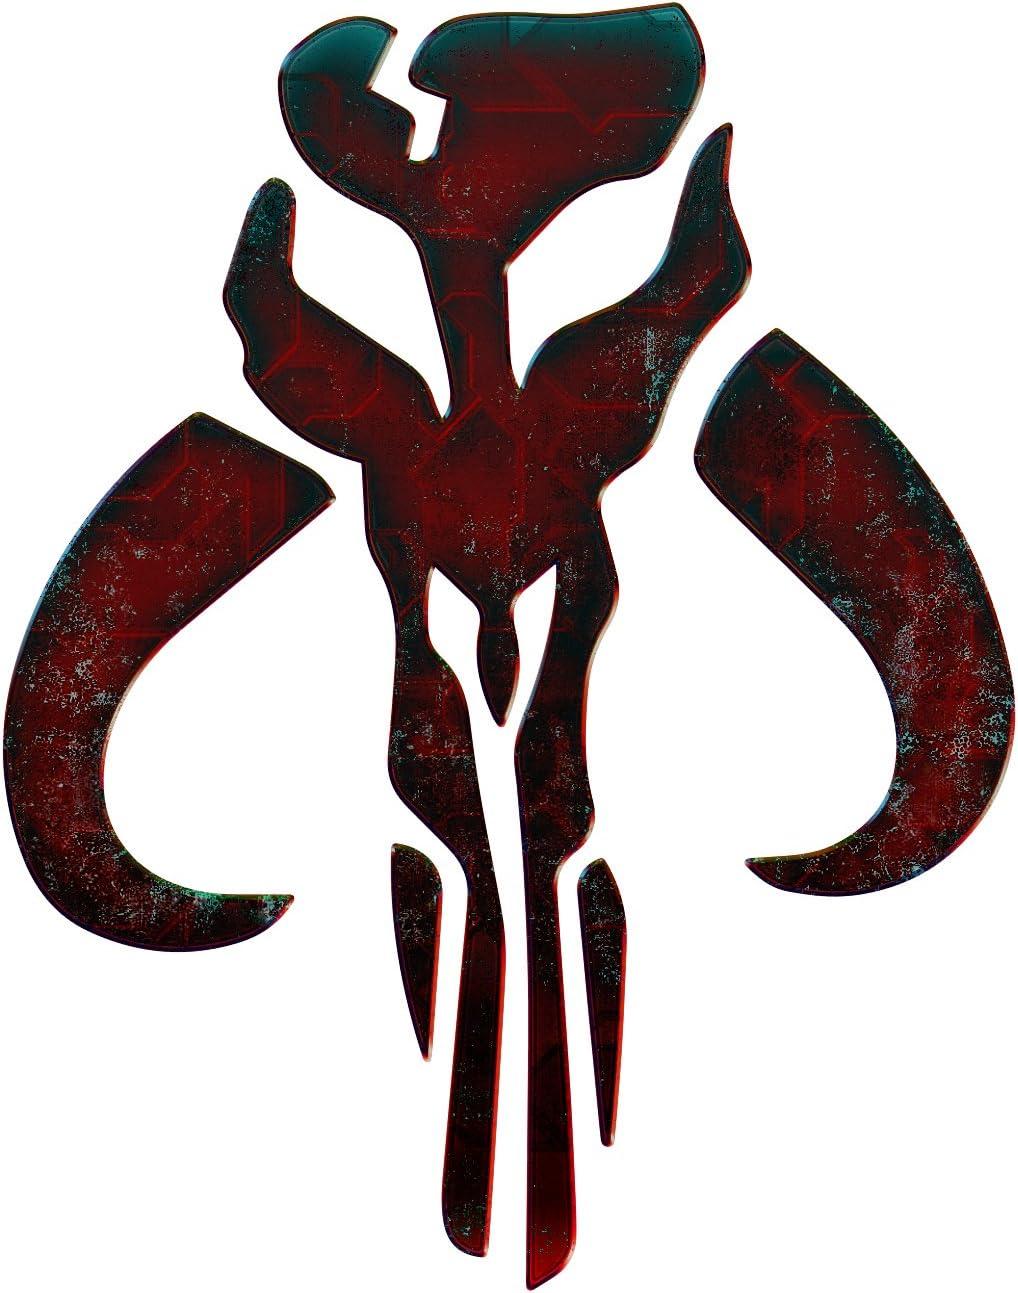 Bargain Max Decals Mandalorian Inspired Skull Dark Red Metal Window Laptop Car Sticker 6